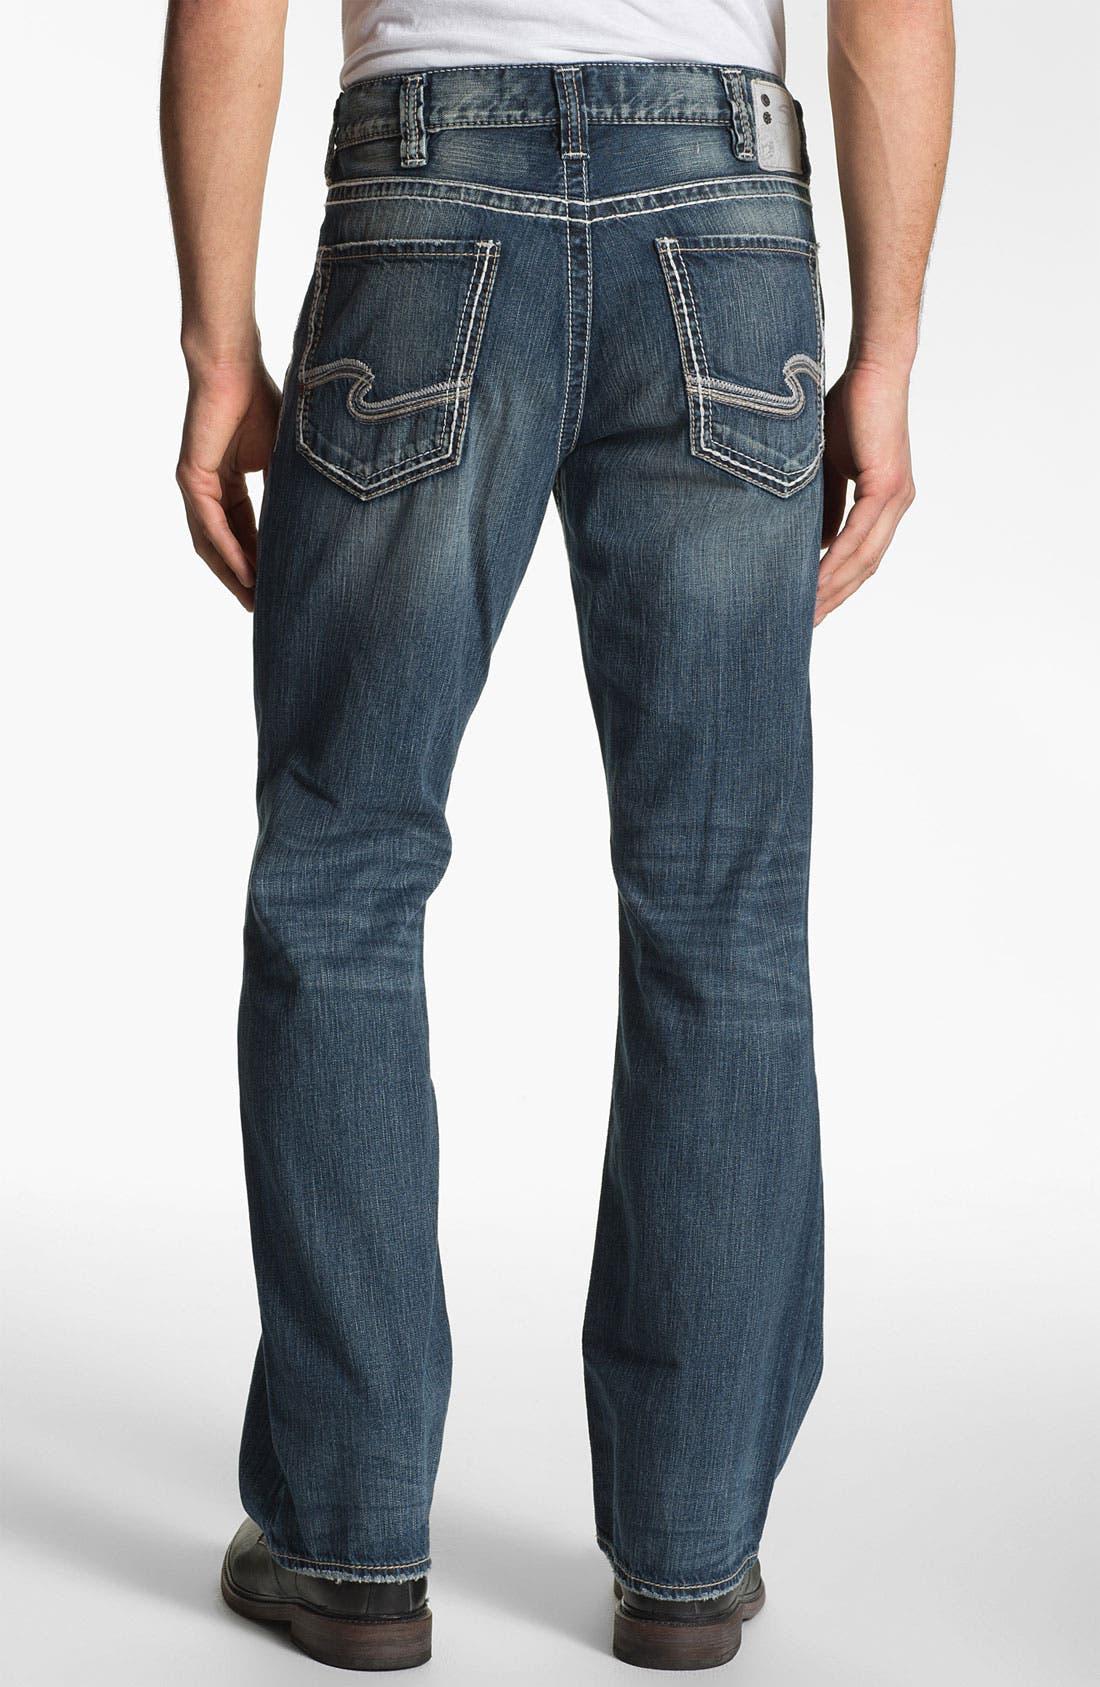 Main Image - Silver Jeans Co. 'Grayson' Bootcut Jeans (Indigo)